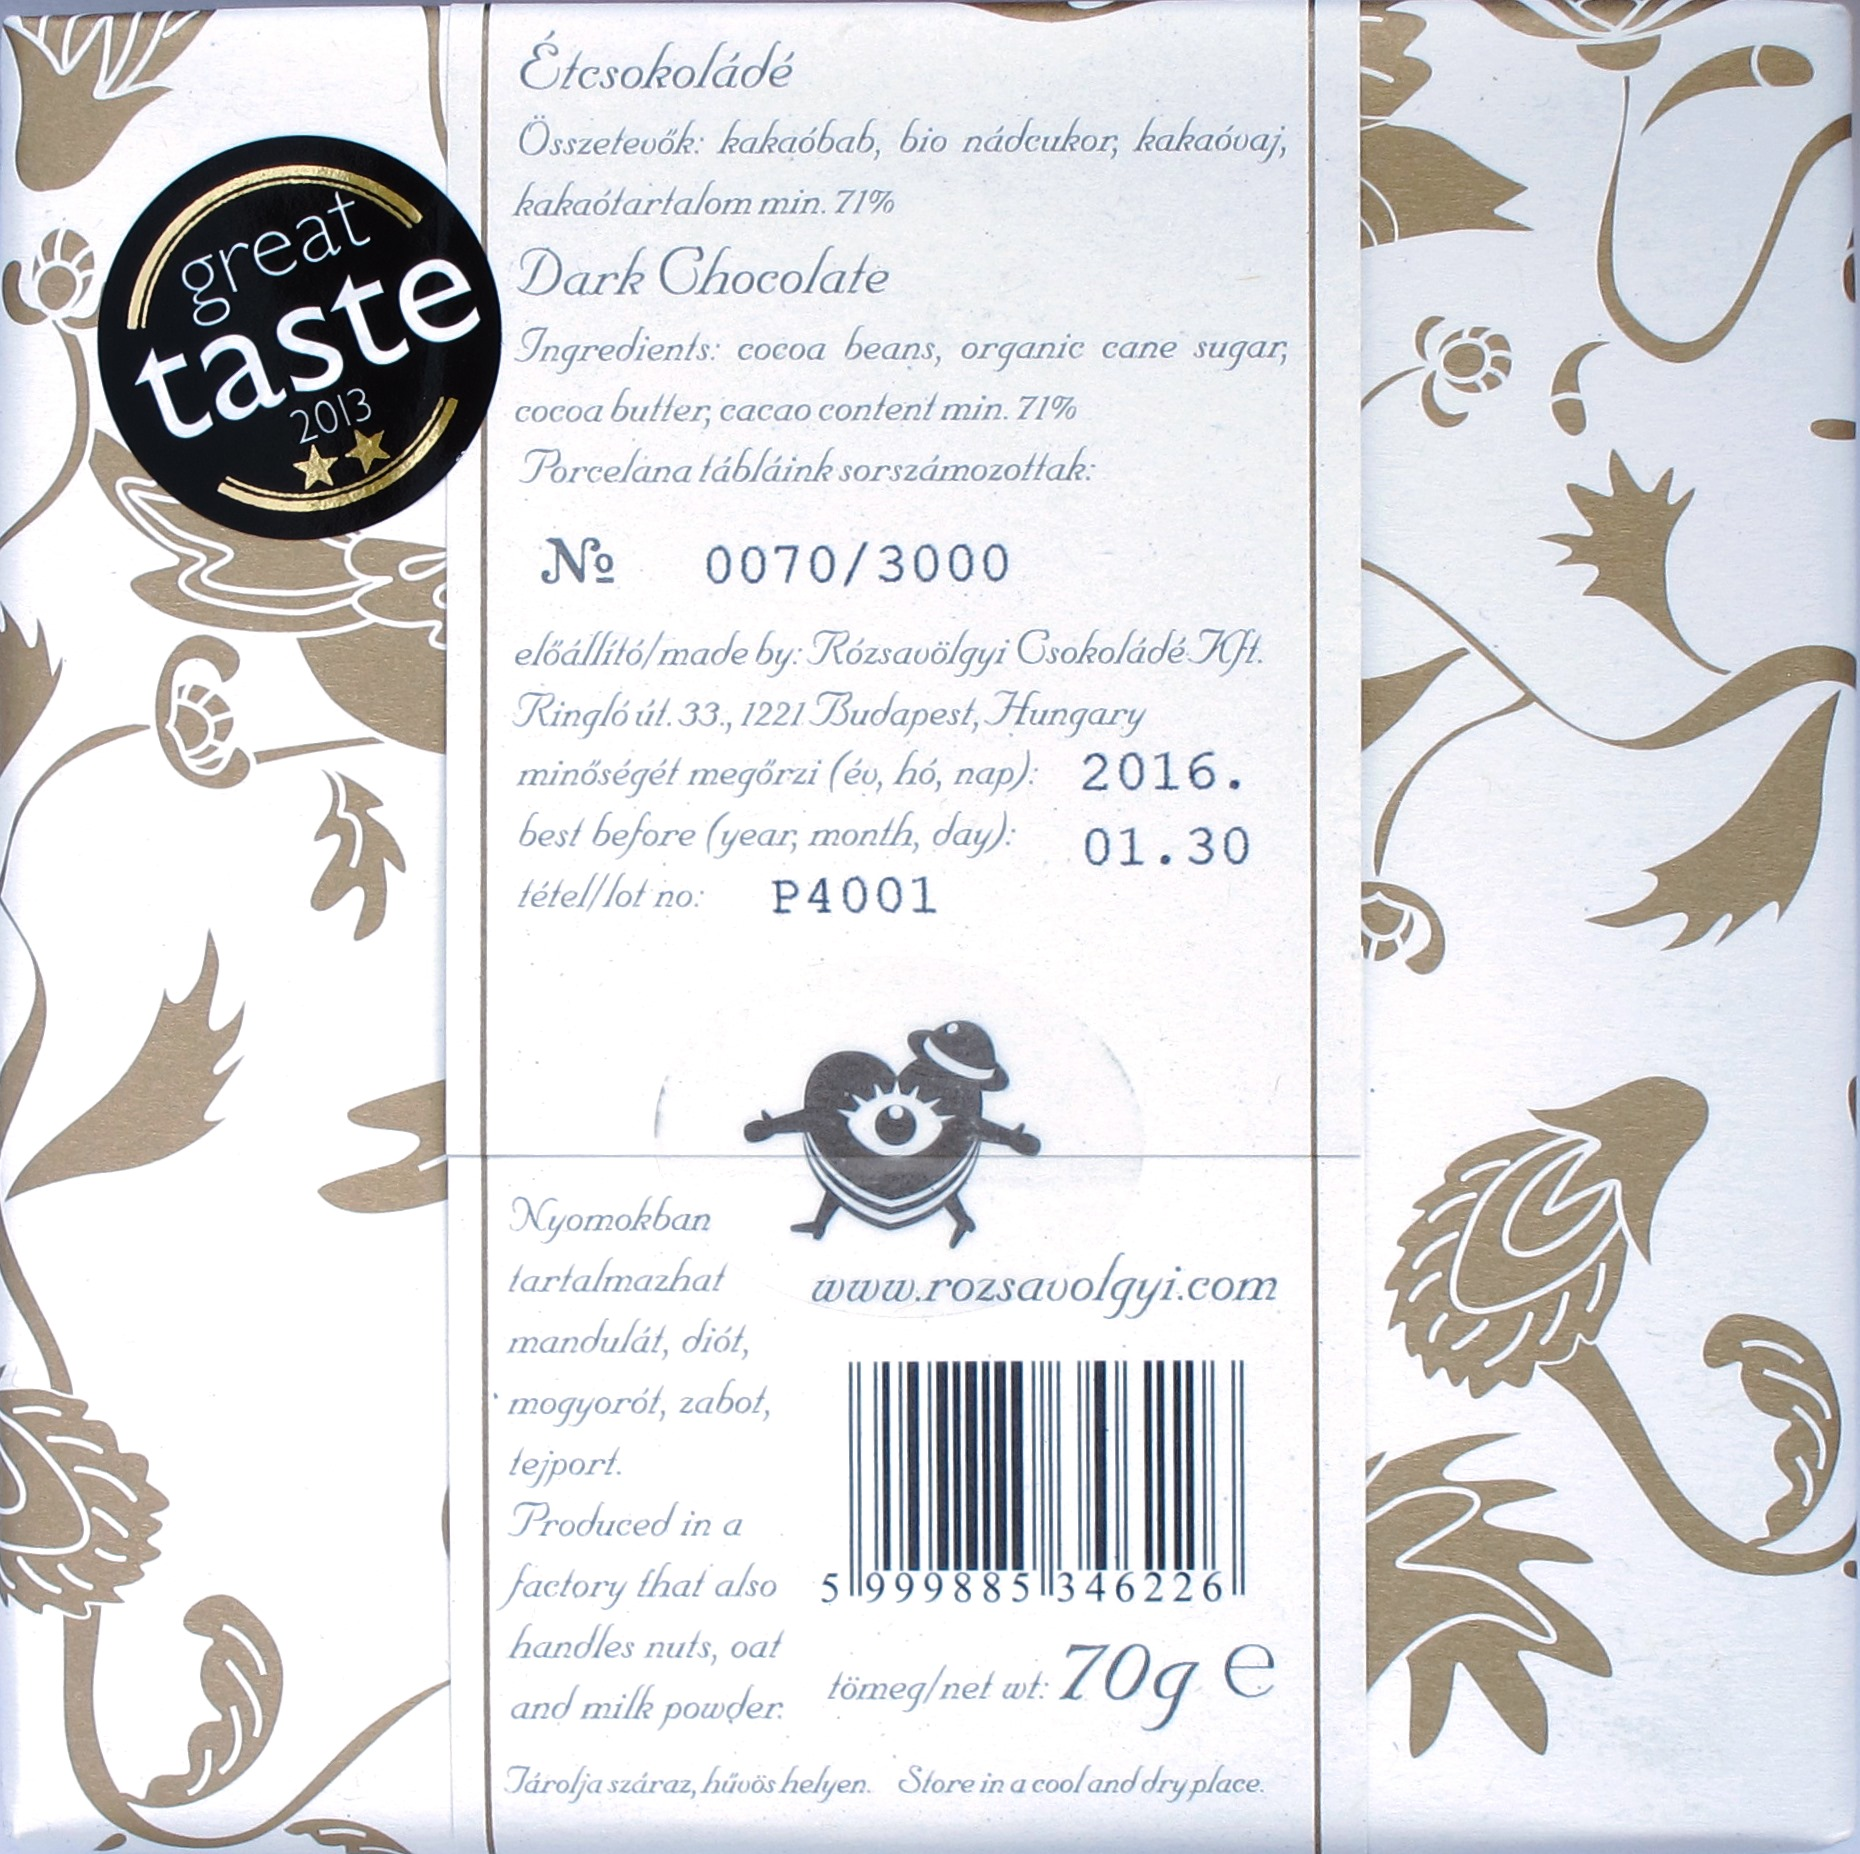 Hussel-Edelbitter-Schokolade 62% (Tafel) bet at home Treuebonuscode Affiliate bet at home | Chclt.net Foto